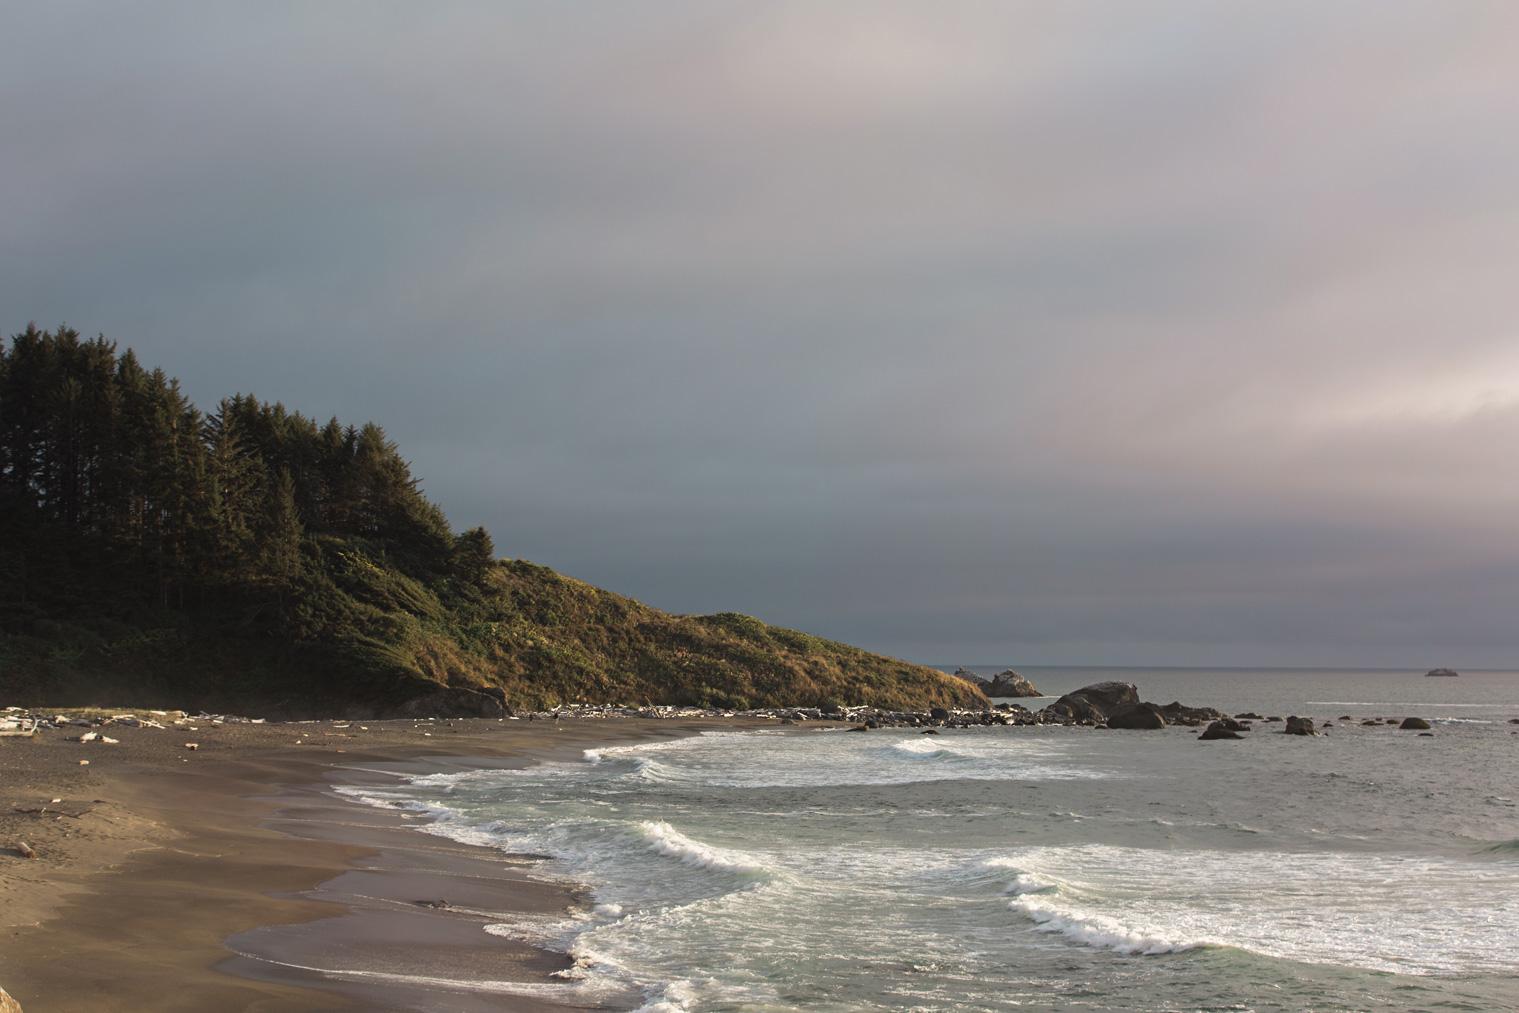 CindyGiovagnoli_Crater_Lake_National_Park_Cape_Perpetua_Heceta_Head_lighthouse_Pacific_Ocean_Cannon_Beach_haystack_Oregon_coast-006.jpg